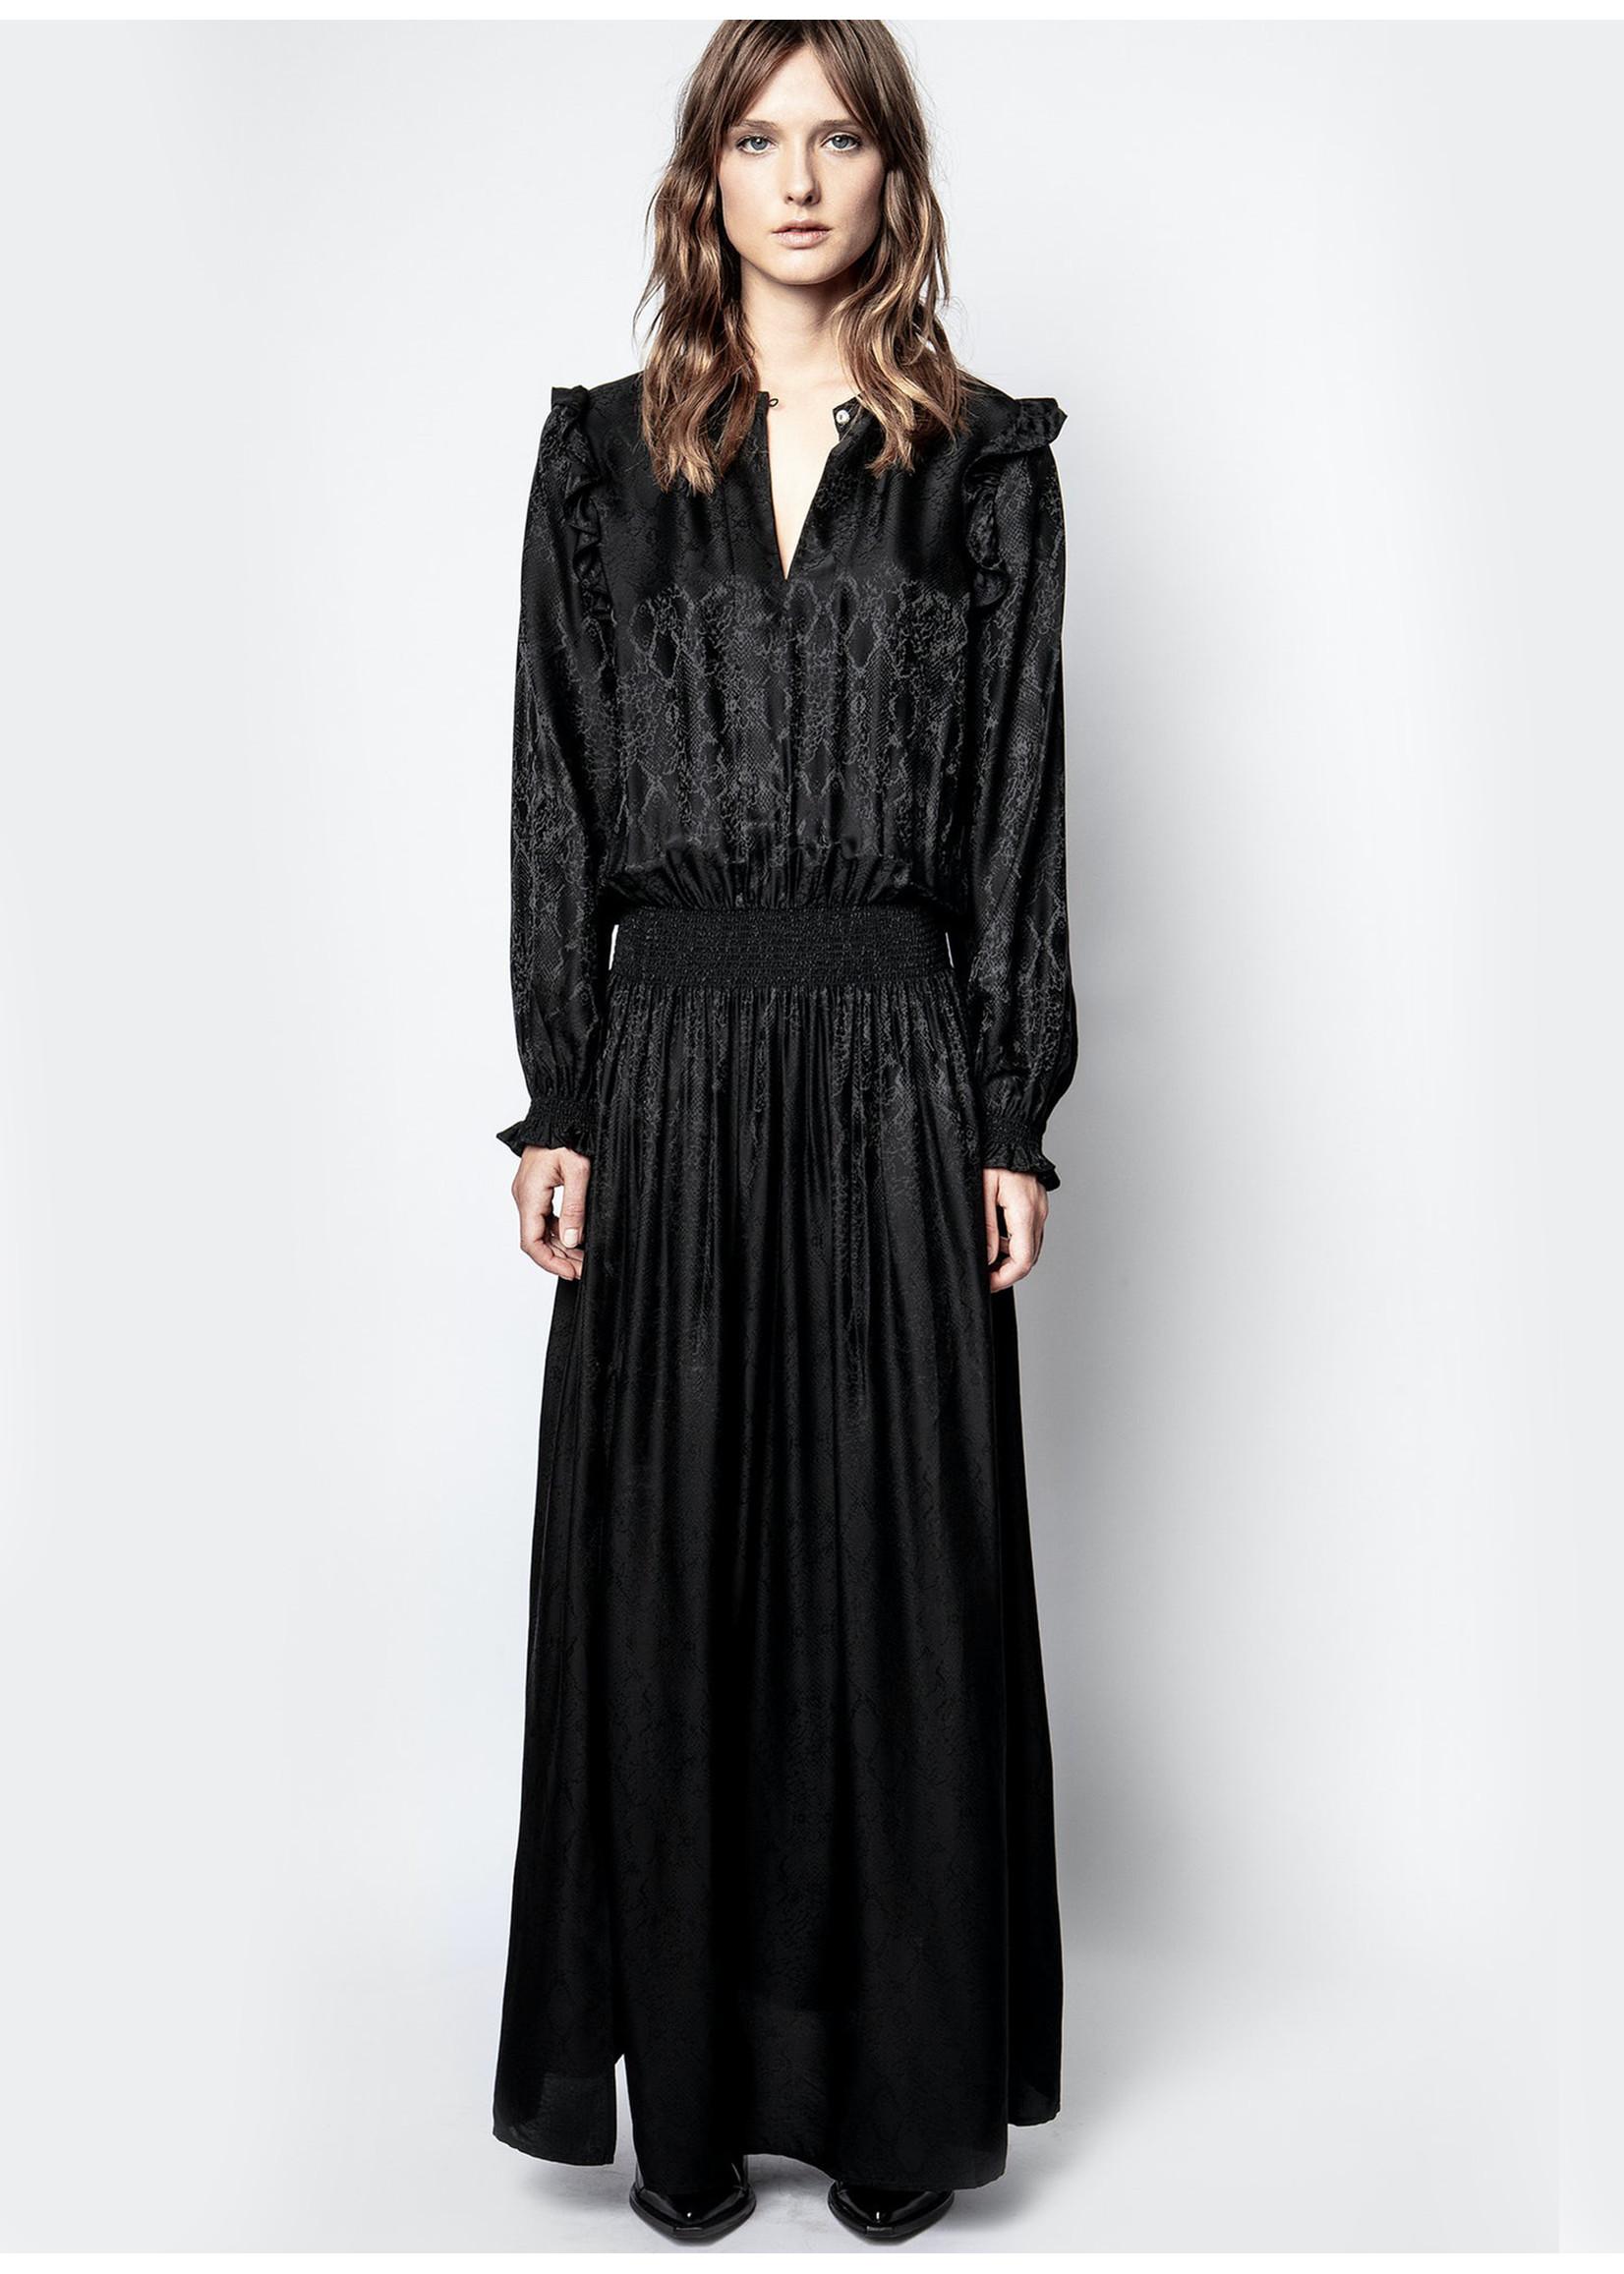 Zadig & Voltaire Roar jac satin dress black